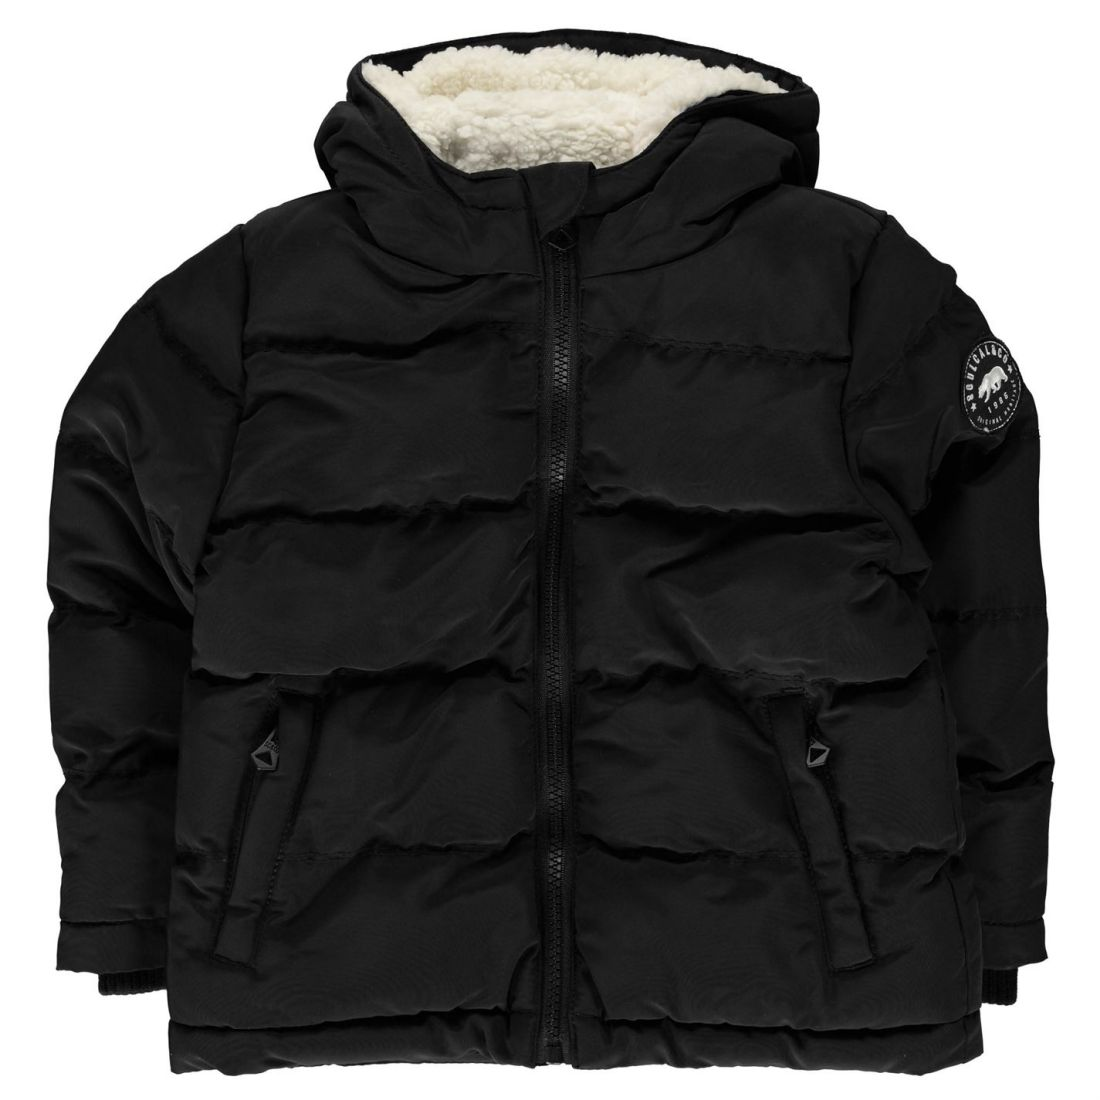 SoulCal Kids Boys Bubble Jacket Infant Padded Coat Top Long Sleeve Chin Guard